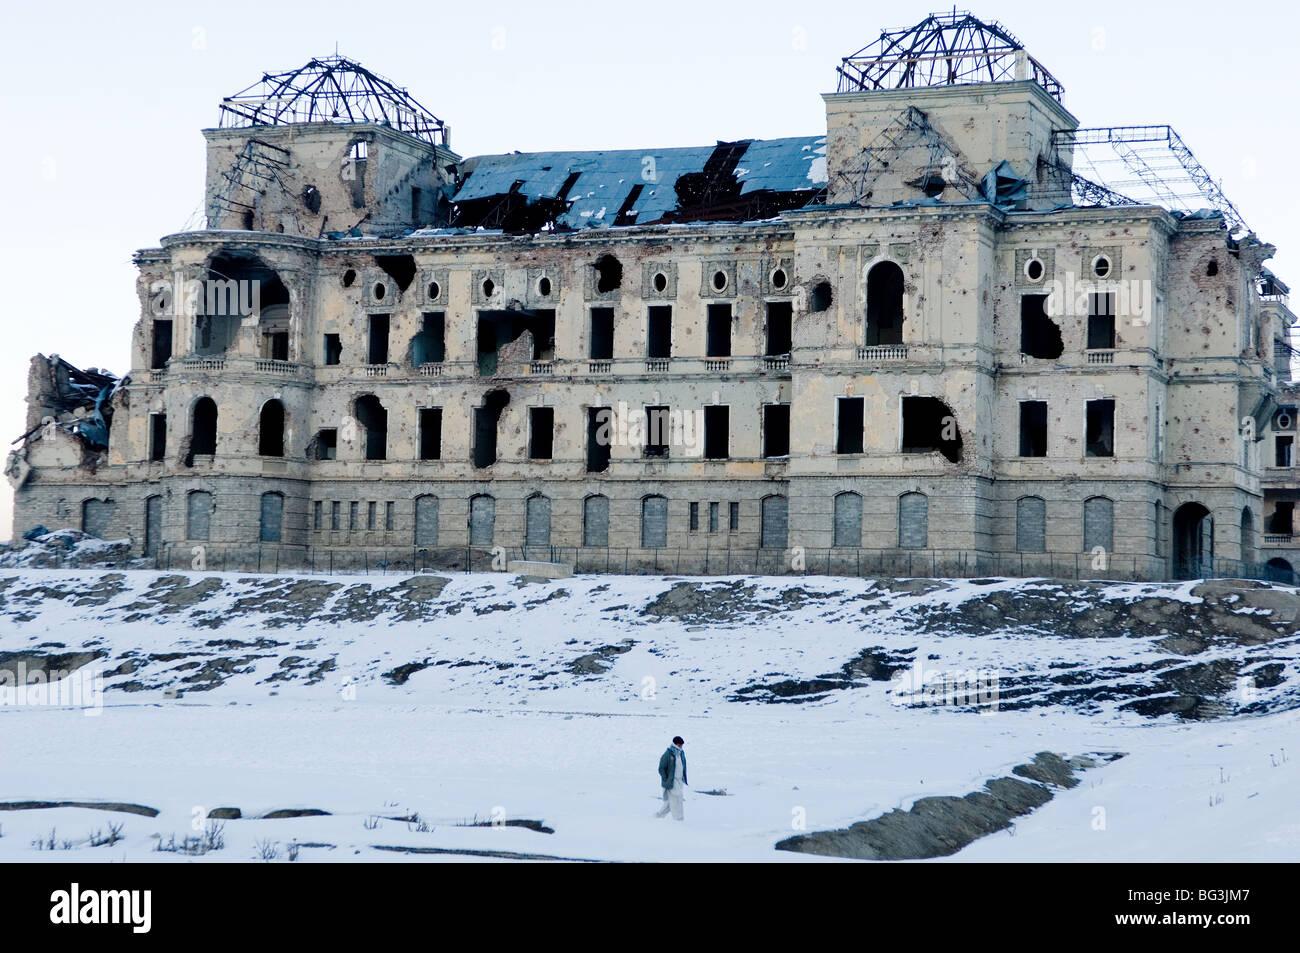 Darul Aman Palace Kabul Afghanistan Stock Photo 27125399 Alamy